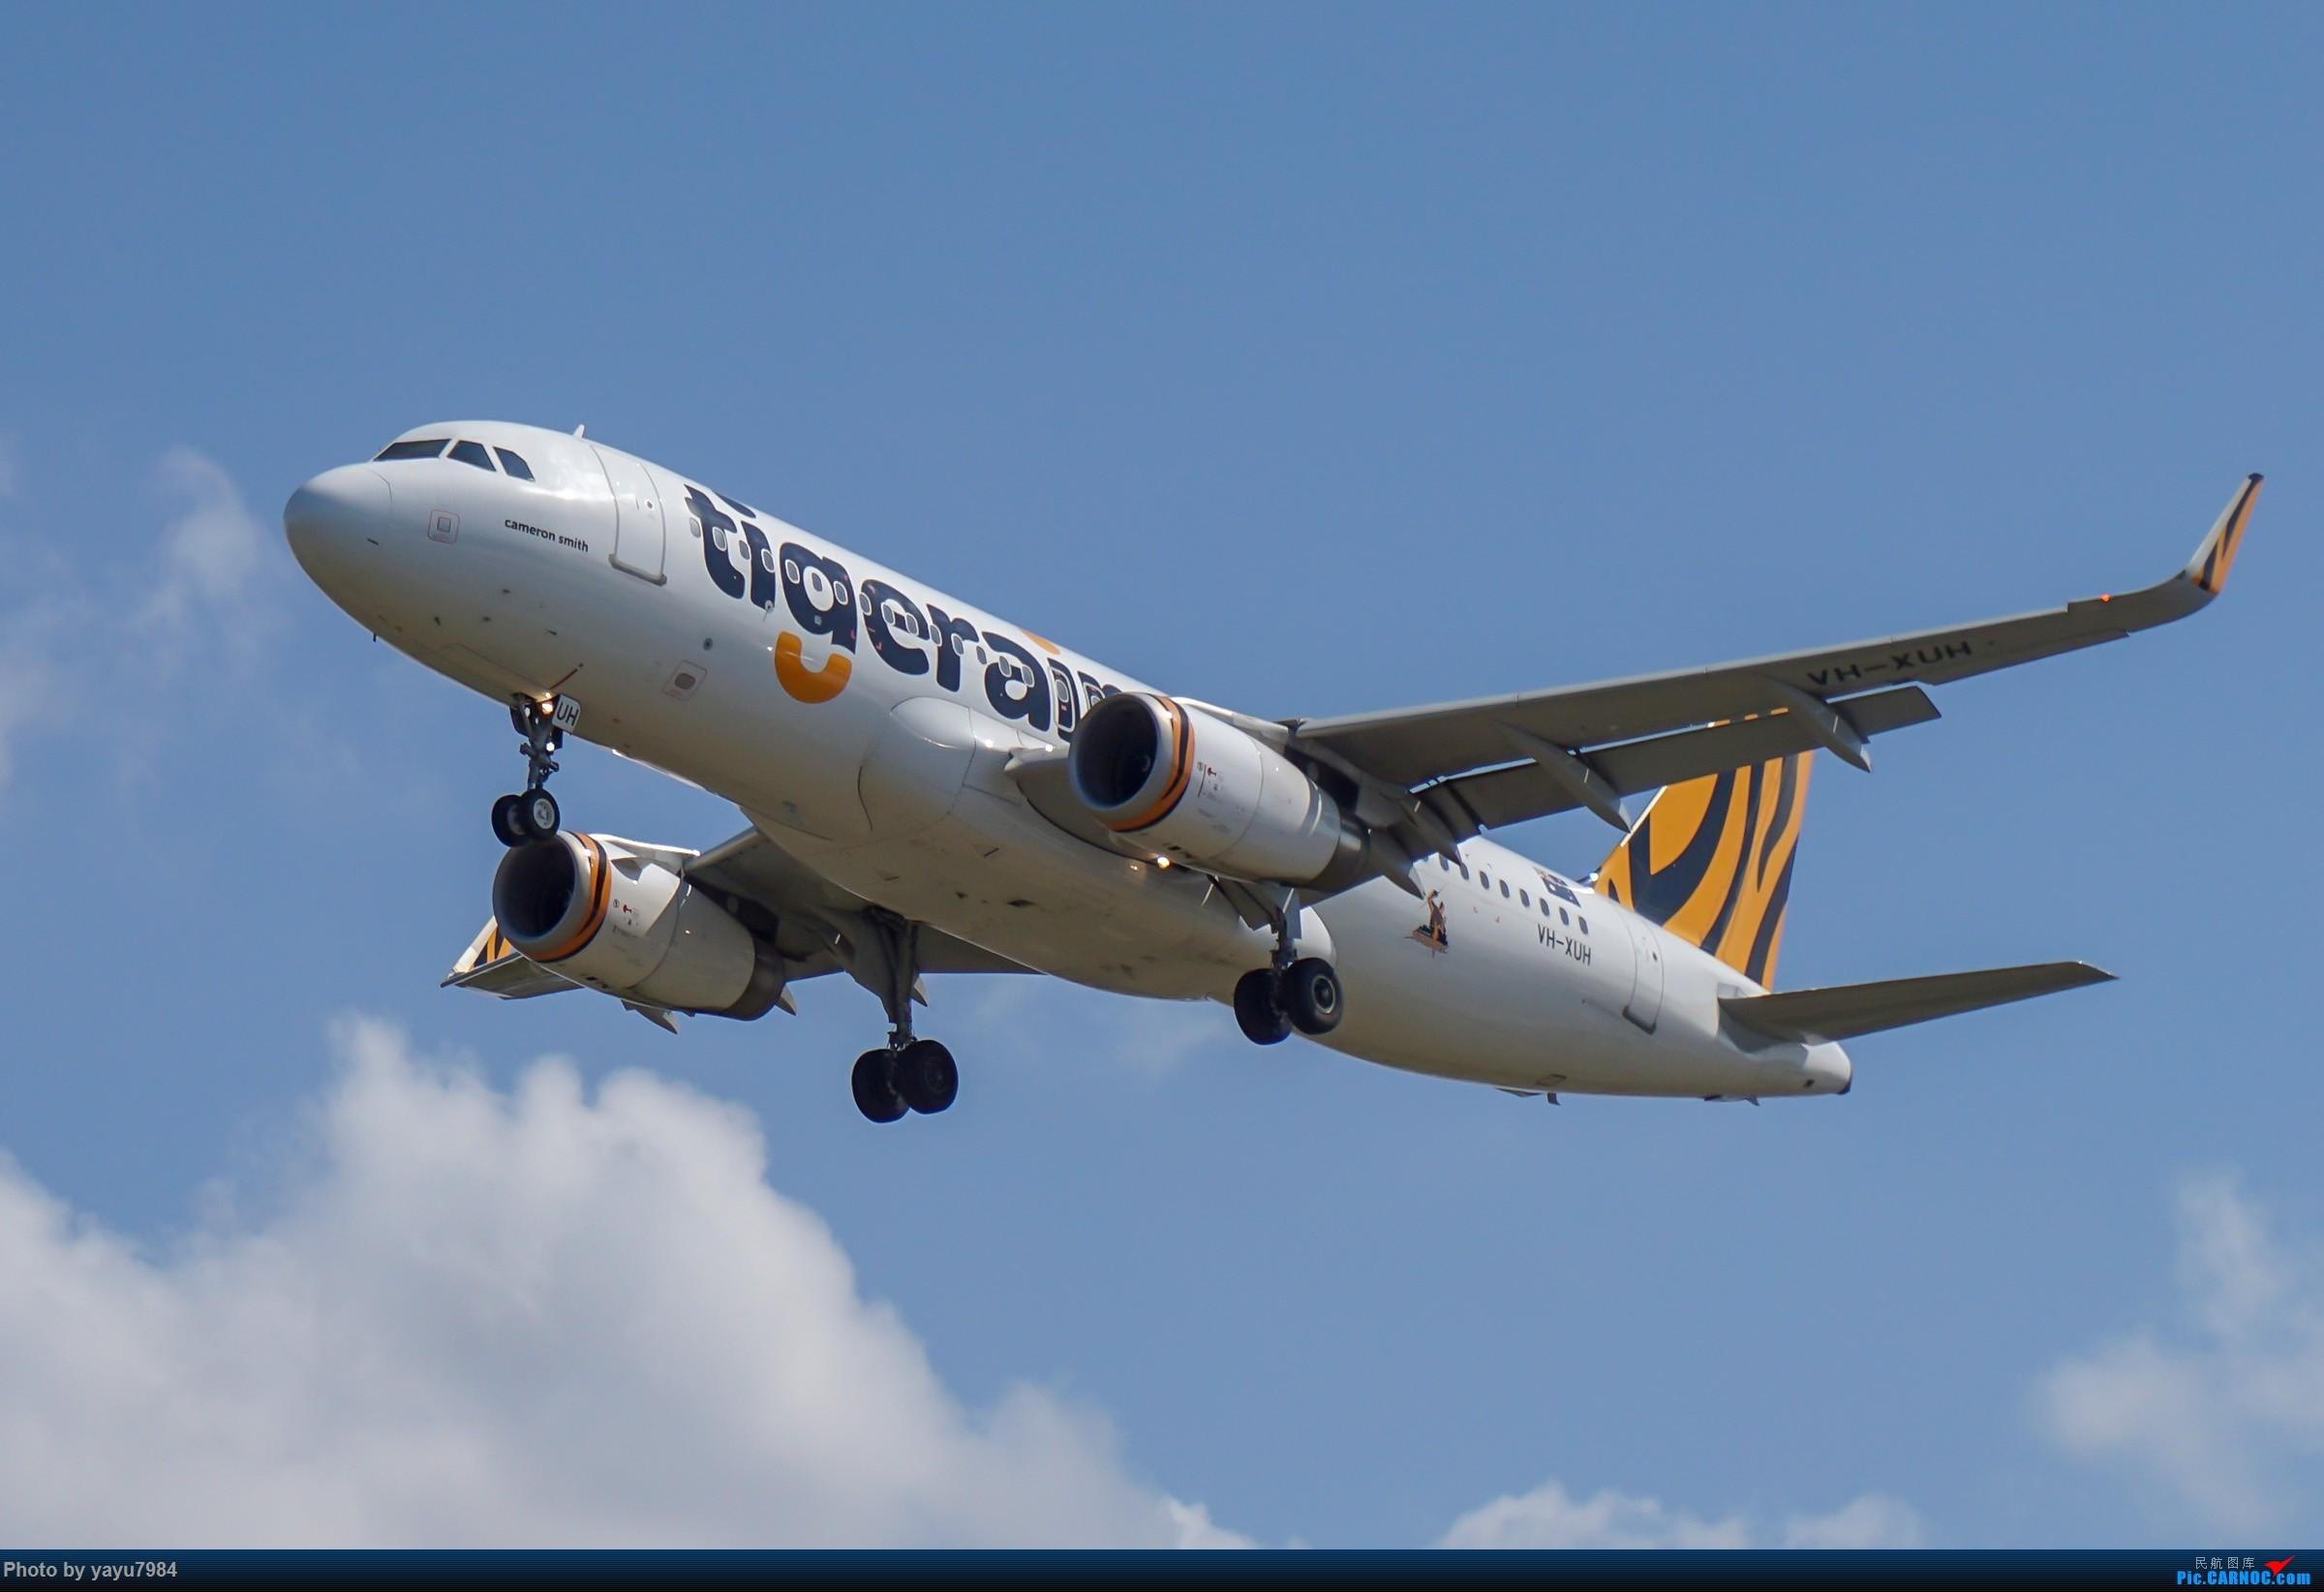 Re:[原创][SYD] 东航天合332,雪绒花343,华航蓝鹊,以及其他日常货 AIRBUS A320-200 VH-XUH 澳大利亚悉尼金斯福德·史密斯机场